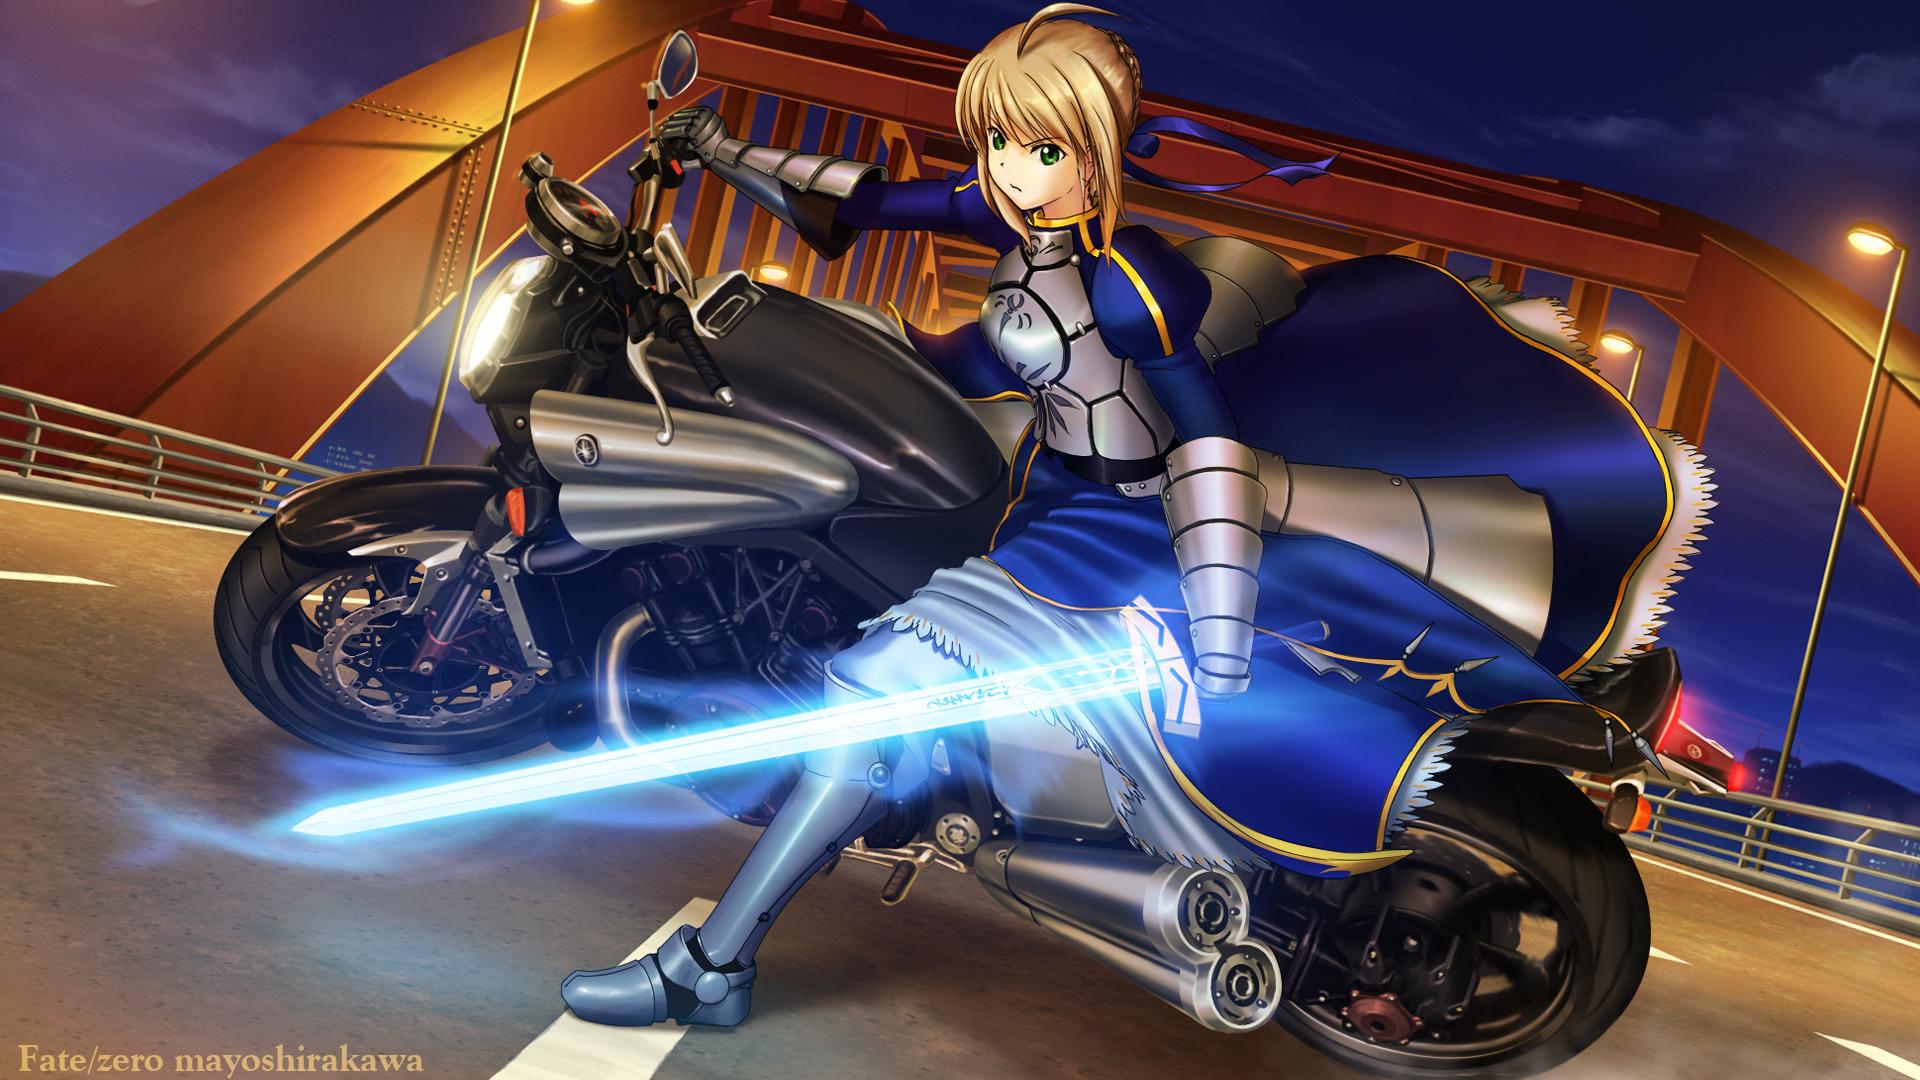 night fate zero motorcycle saber shirakawa mayo sword weapon wallpaper 1920x1080